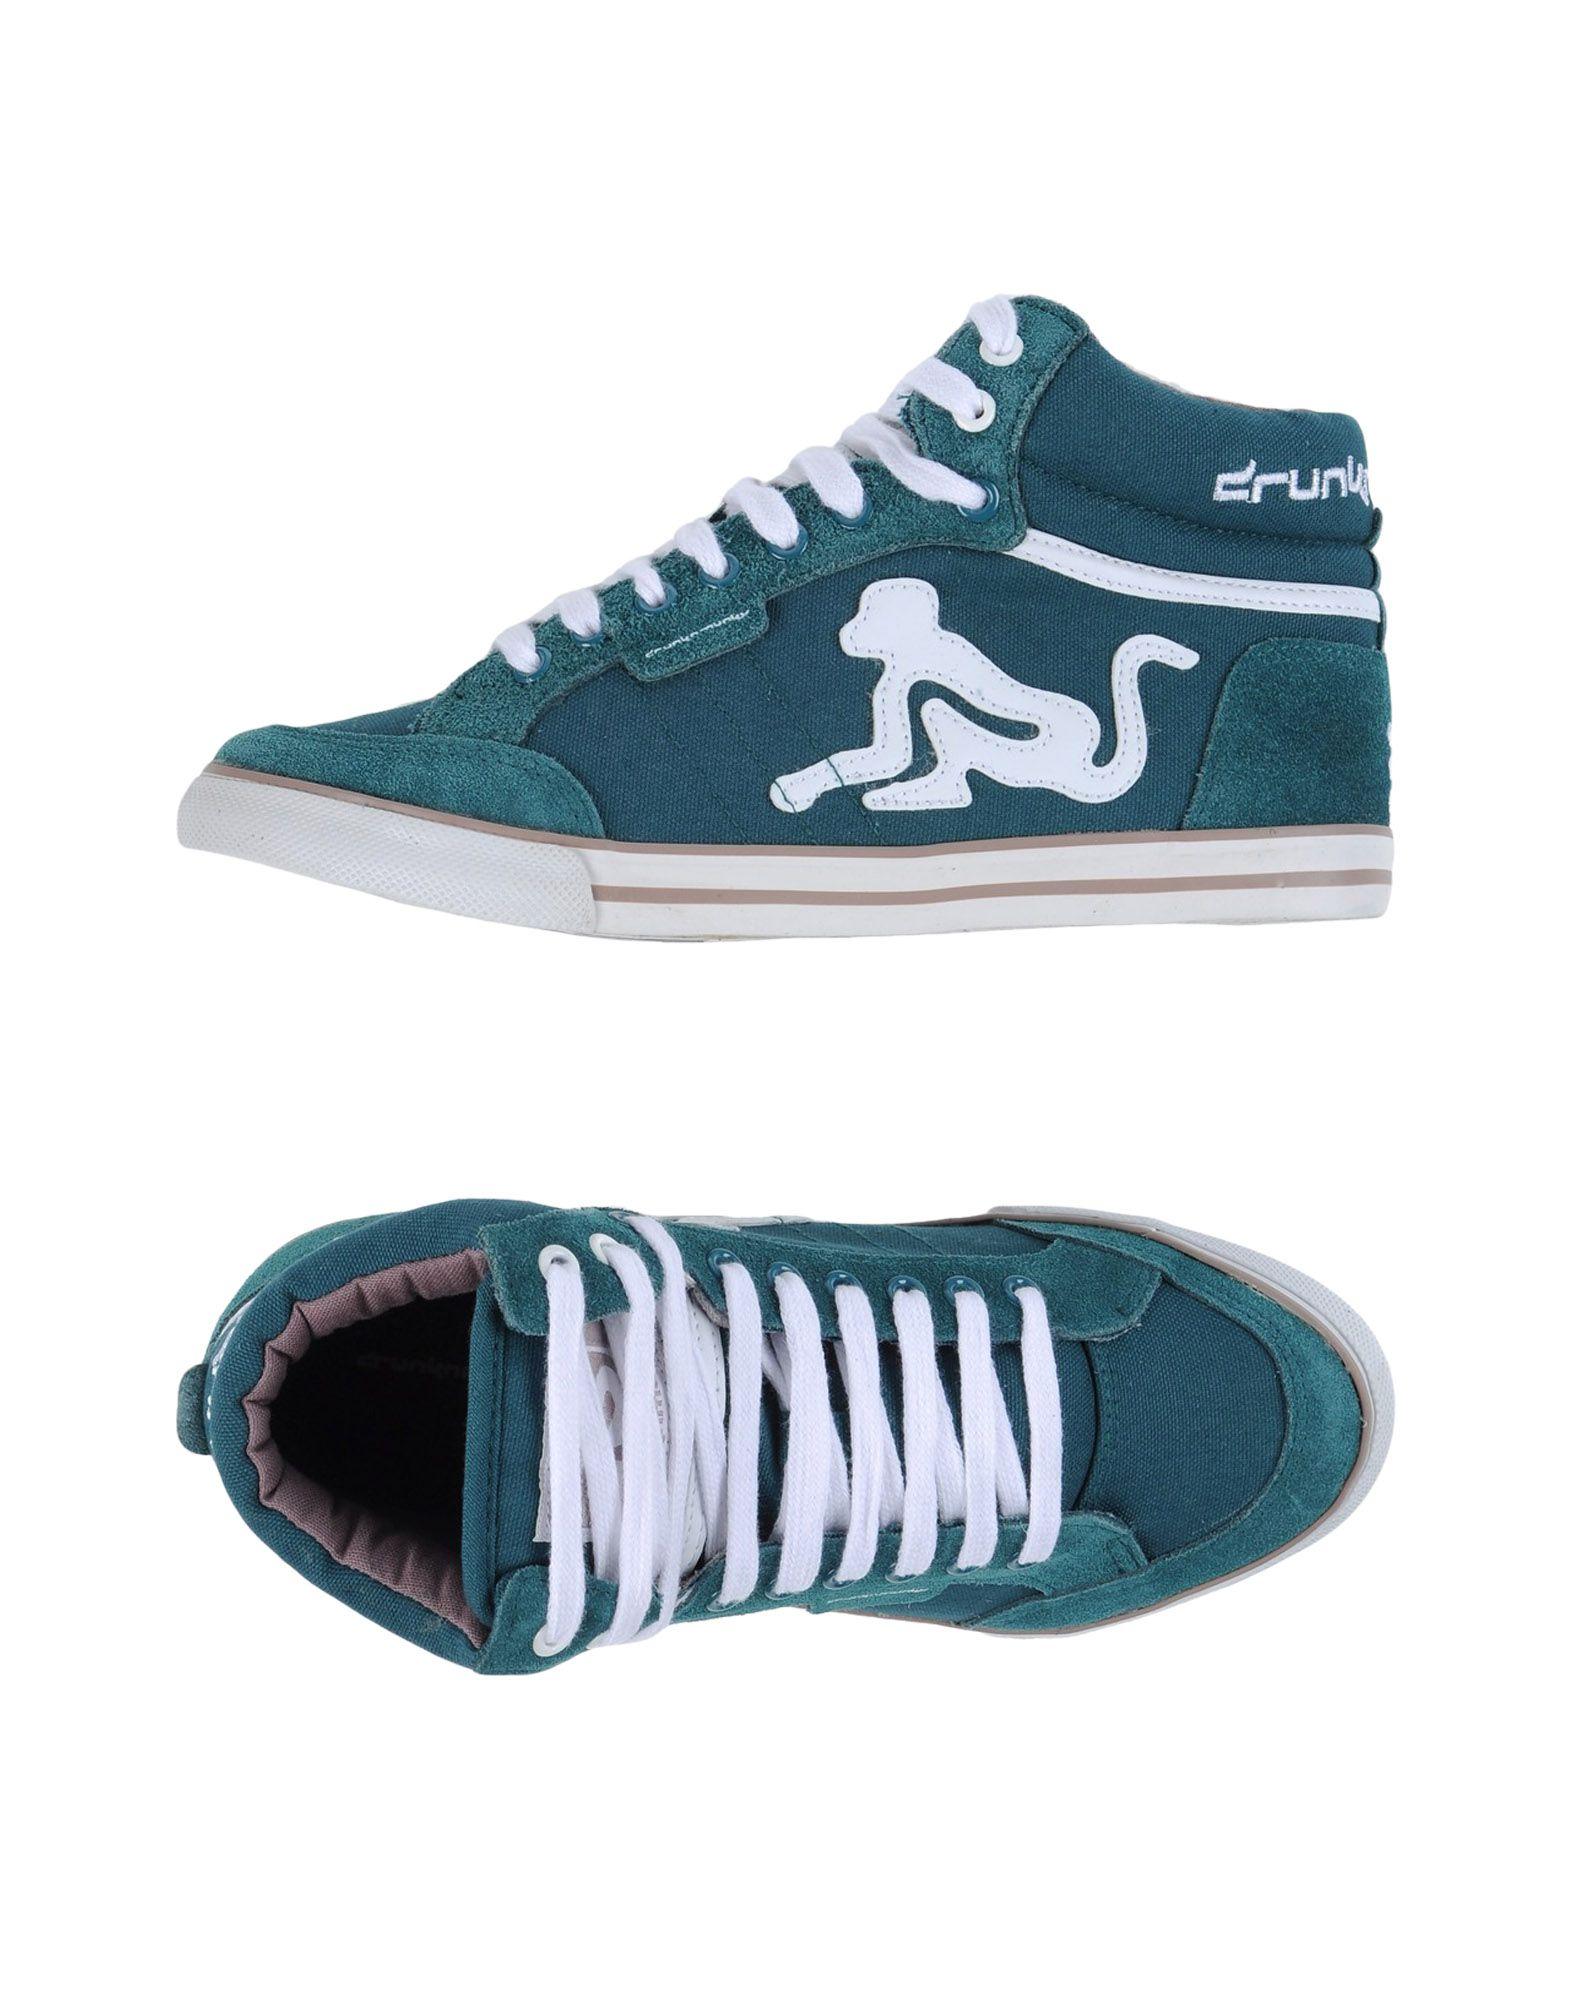 Drunknmunky Sneakers 11344854JW Herren  11344854JW Sneakers Heiße Schuhe 54e0b7